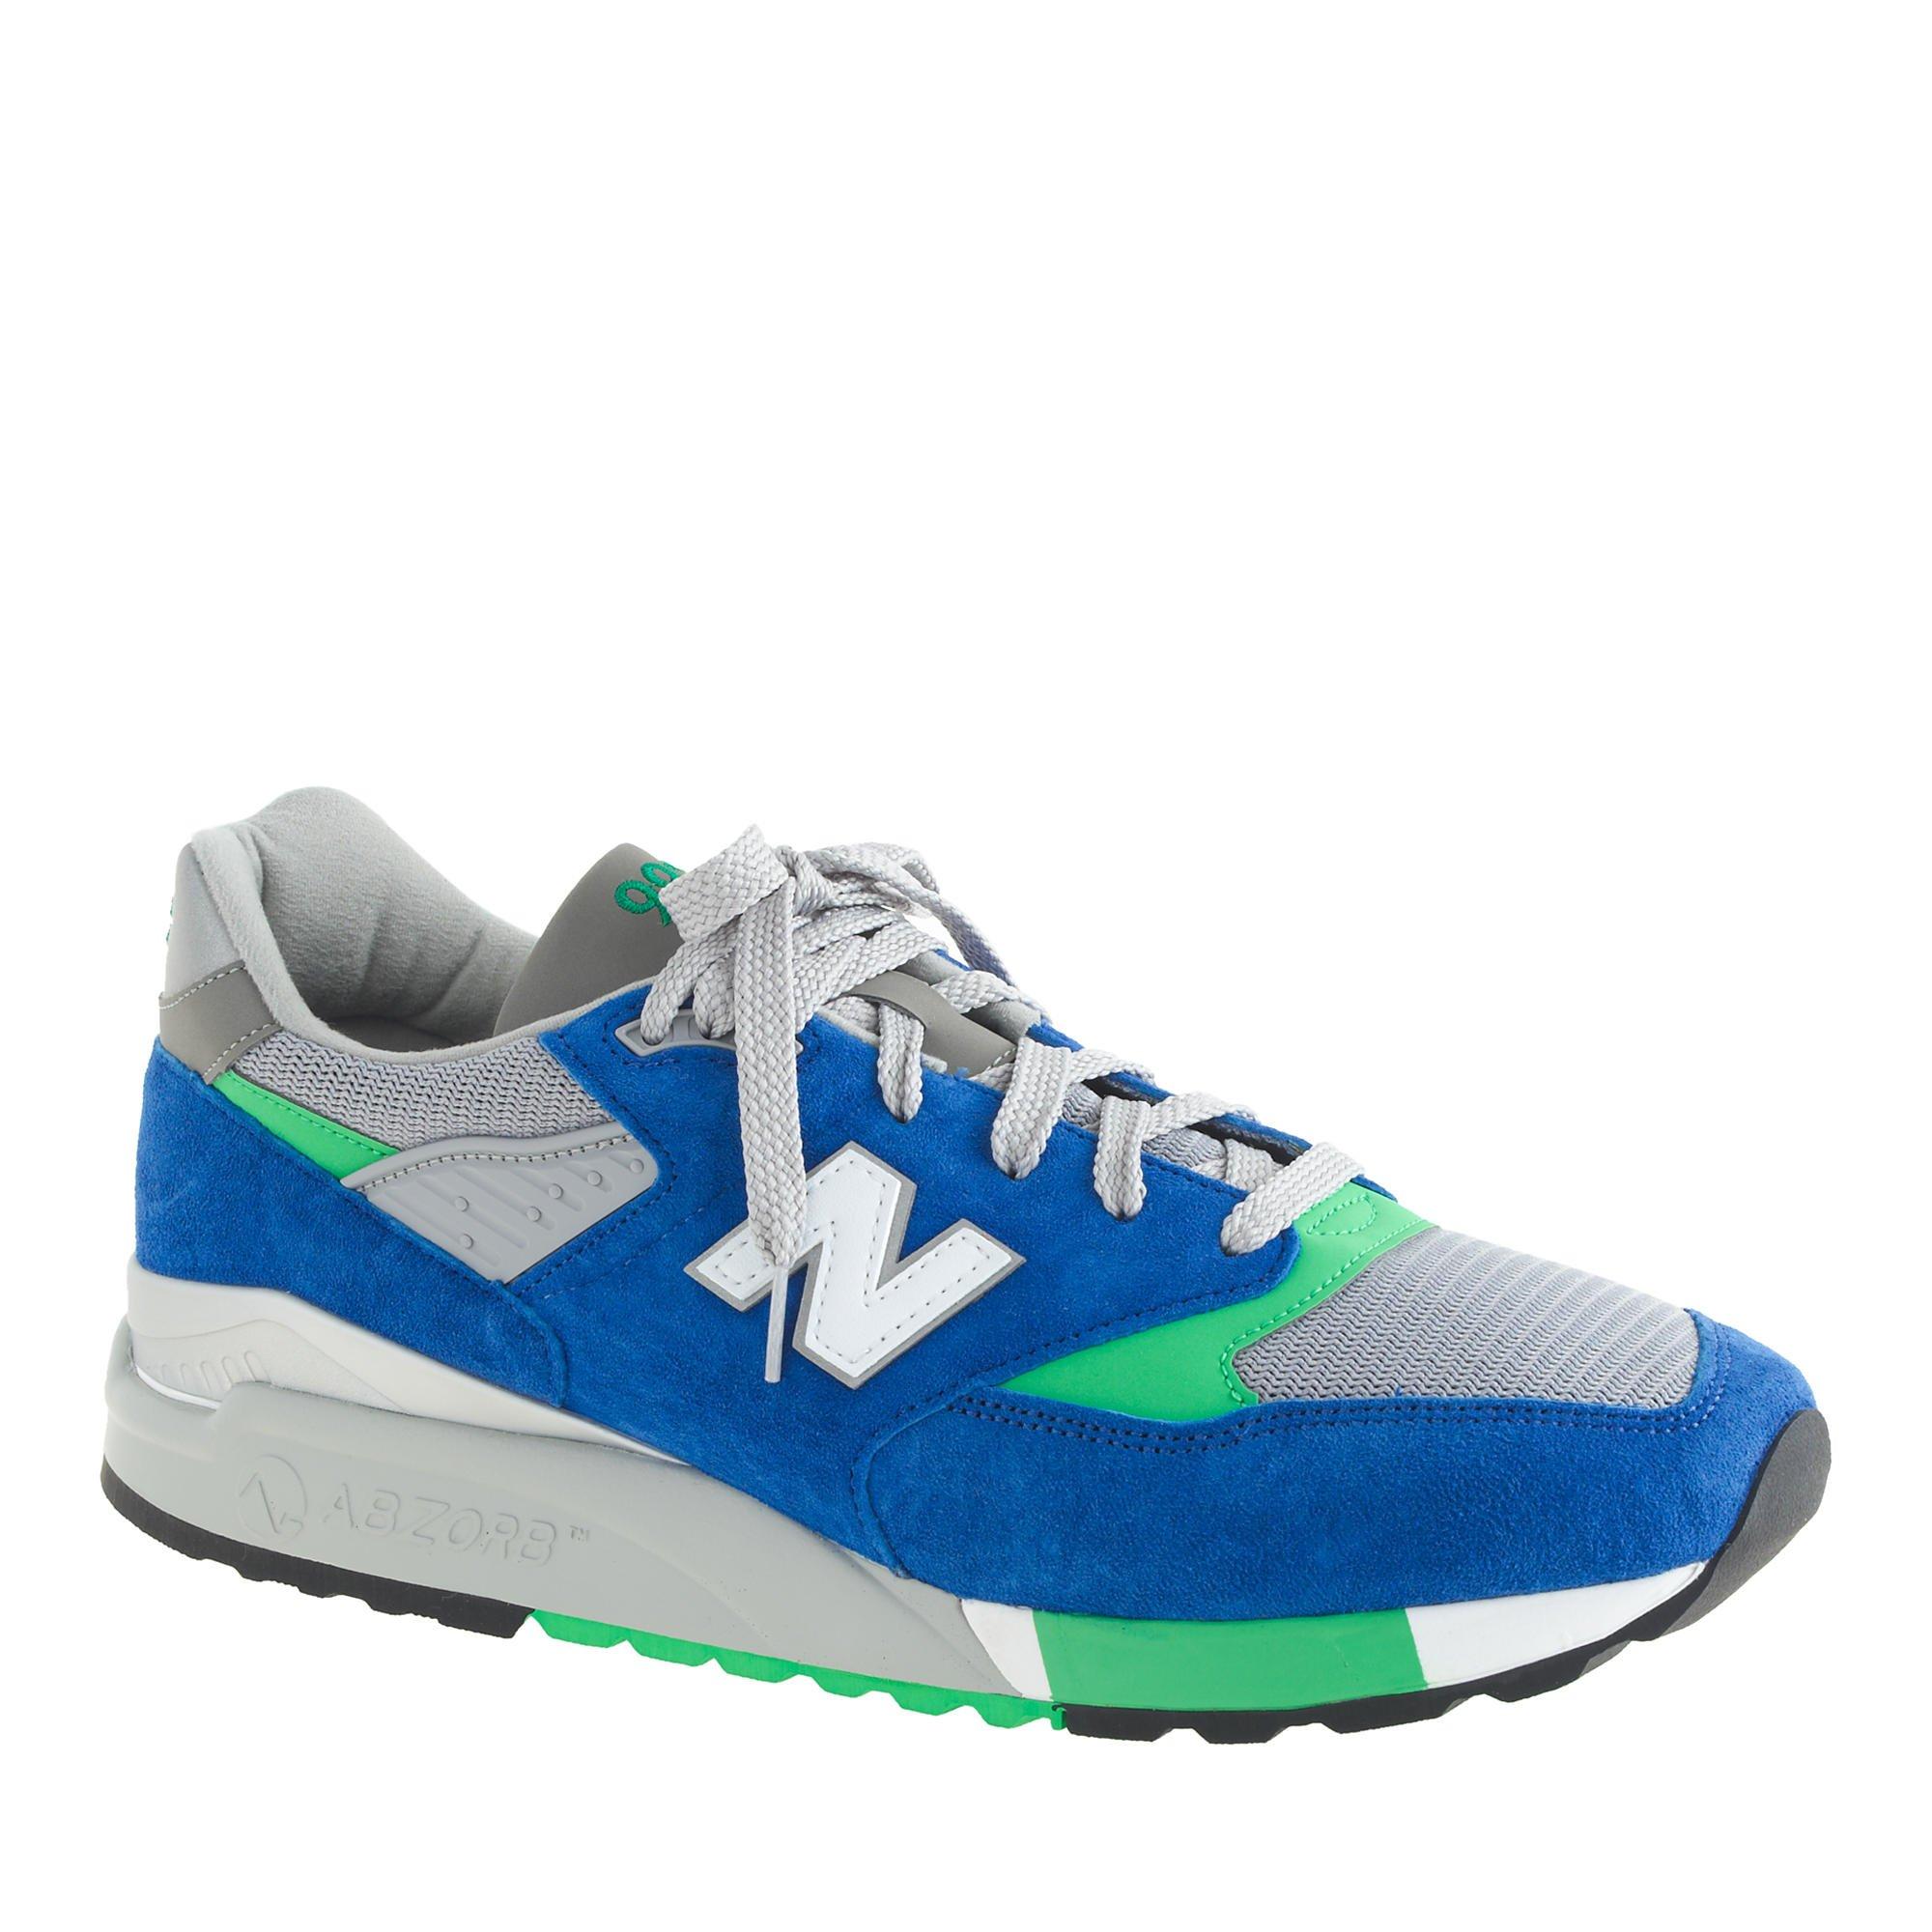 New Balance Shoes Skowhegan Maine